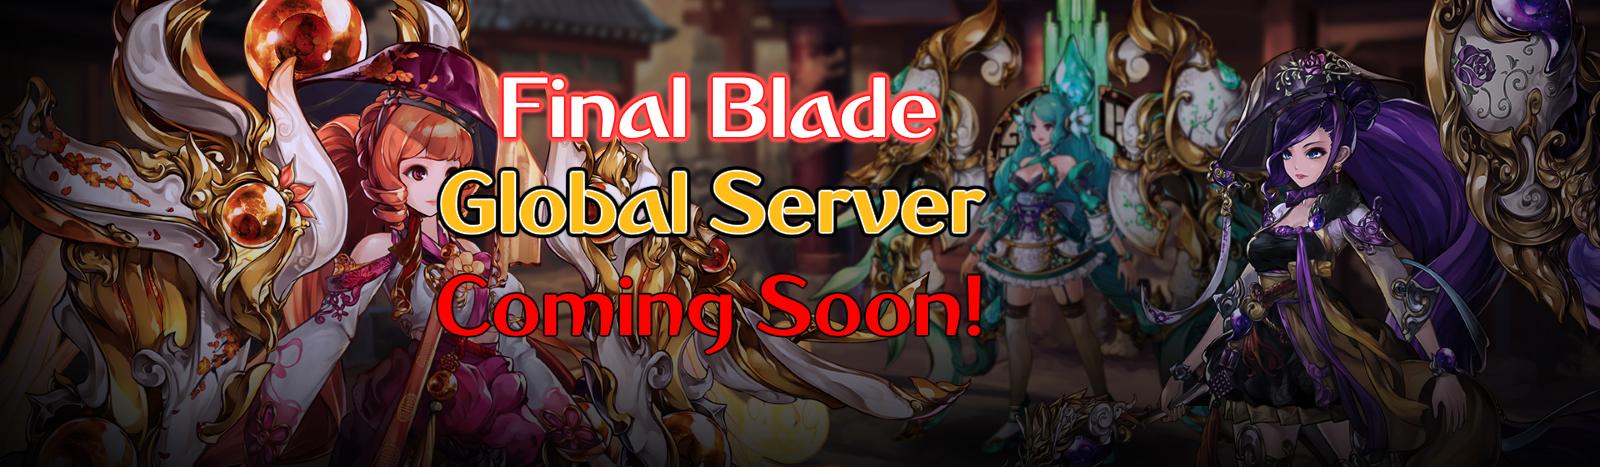 Final Blade -  Global Server